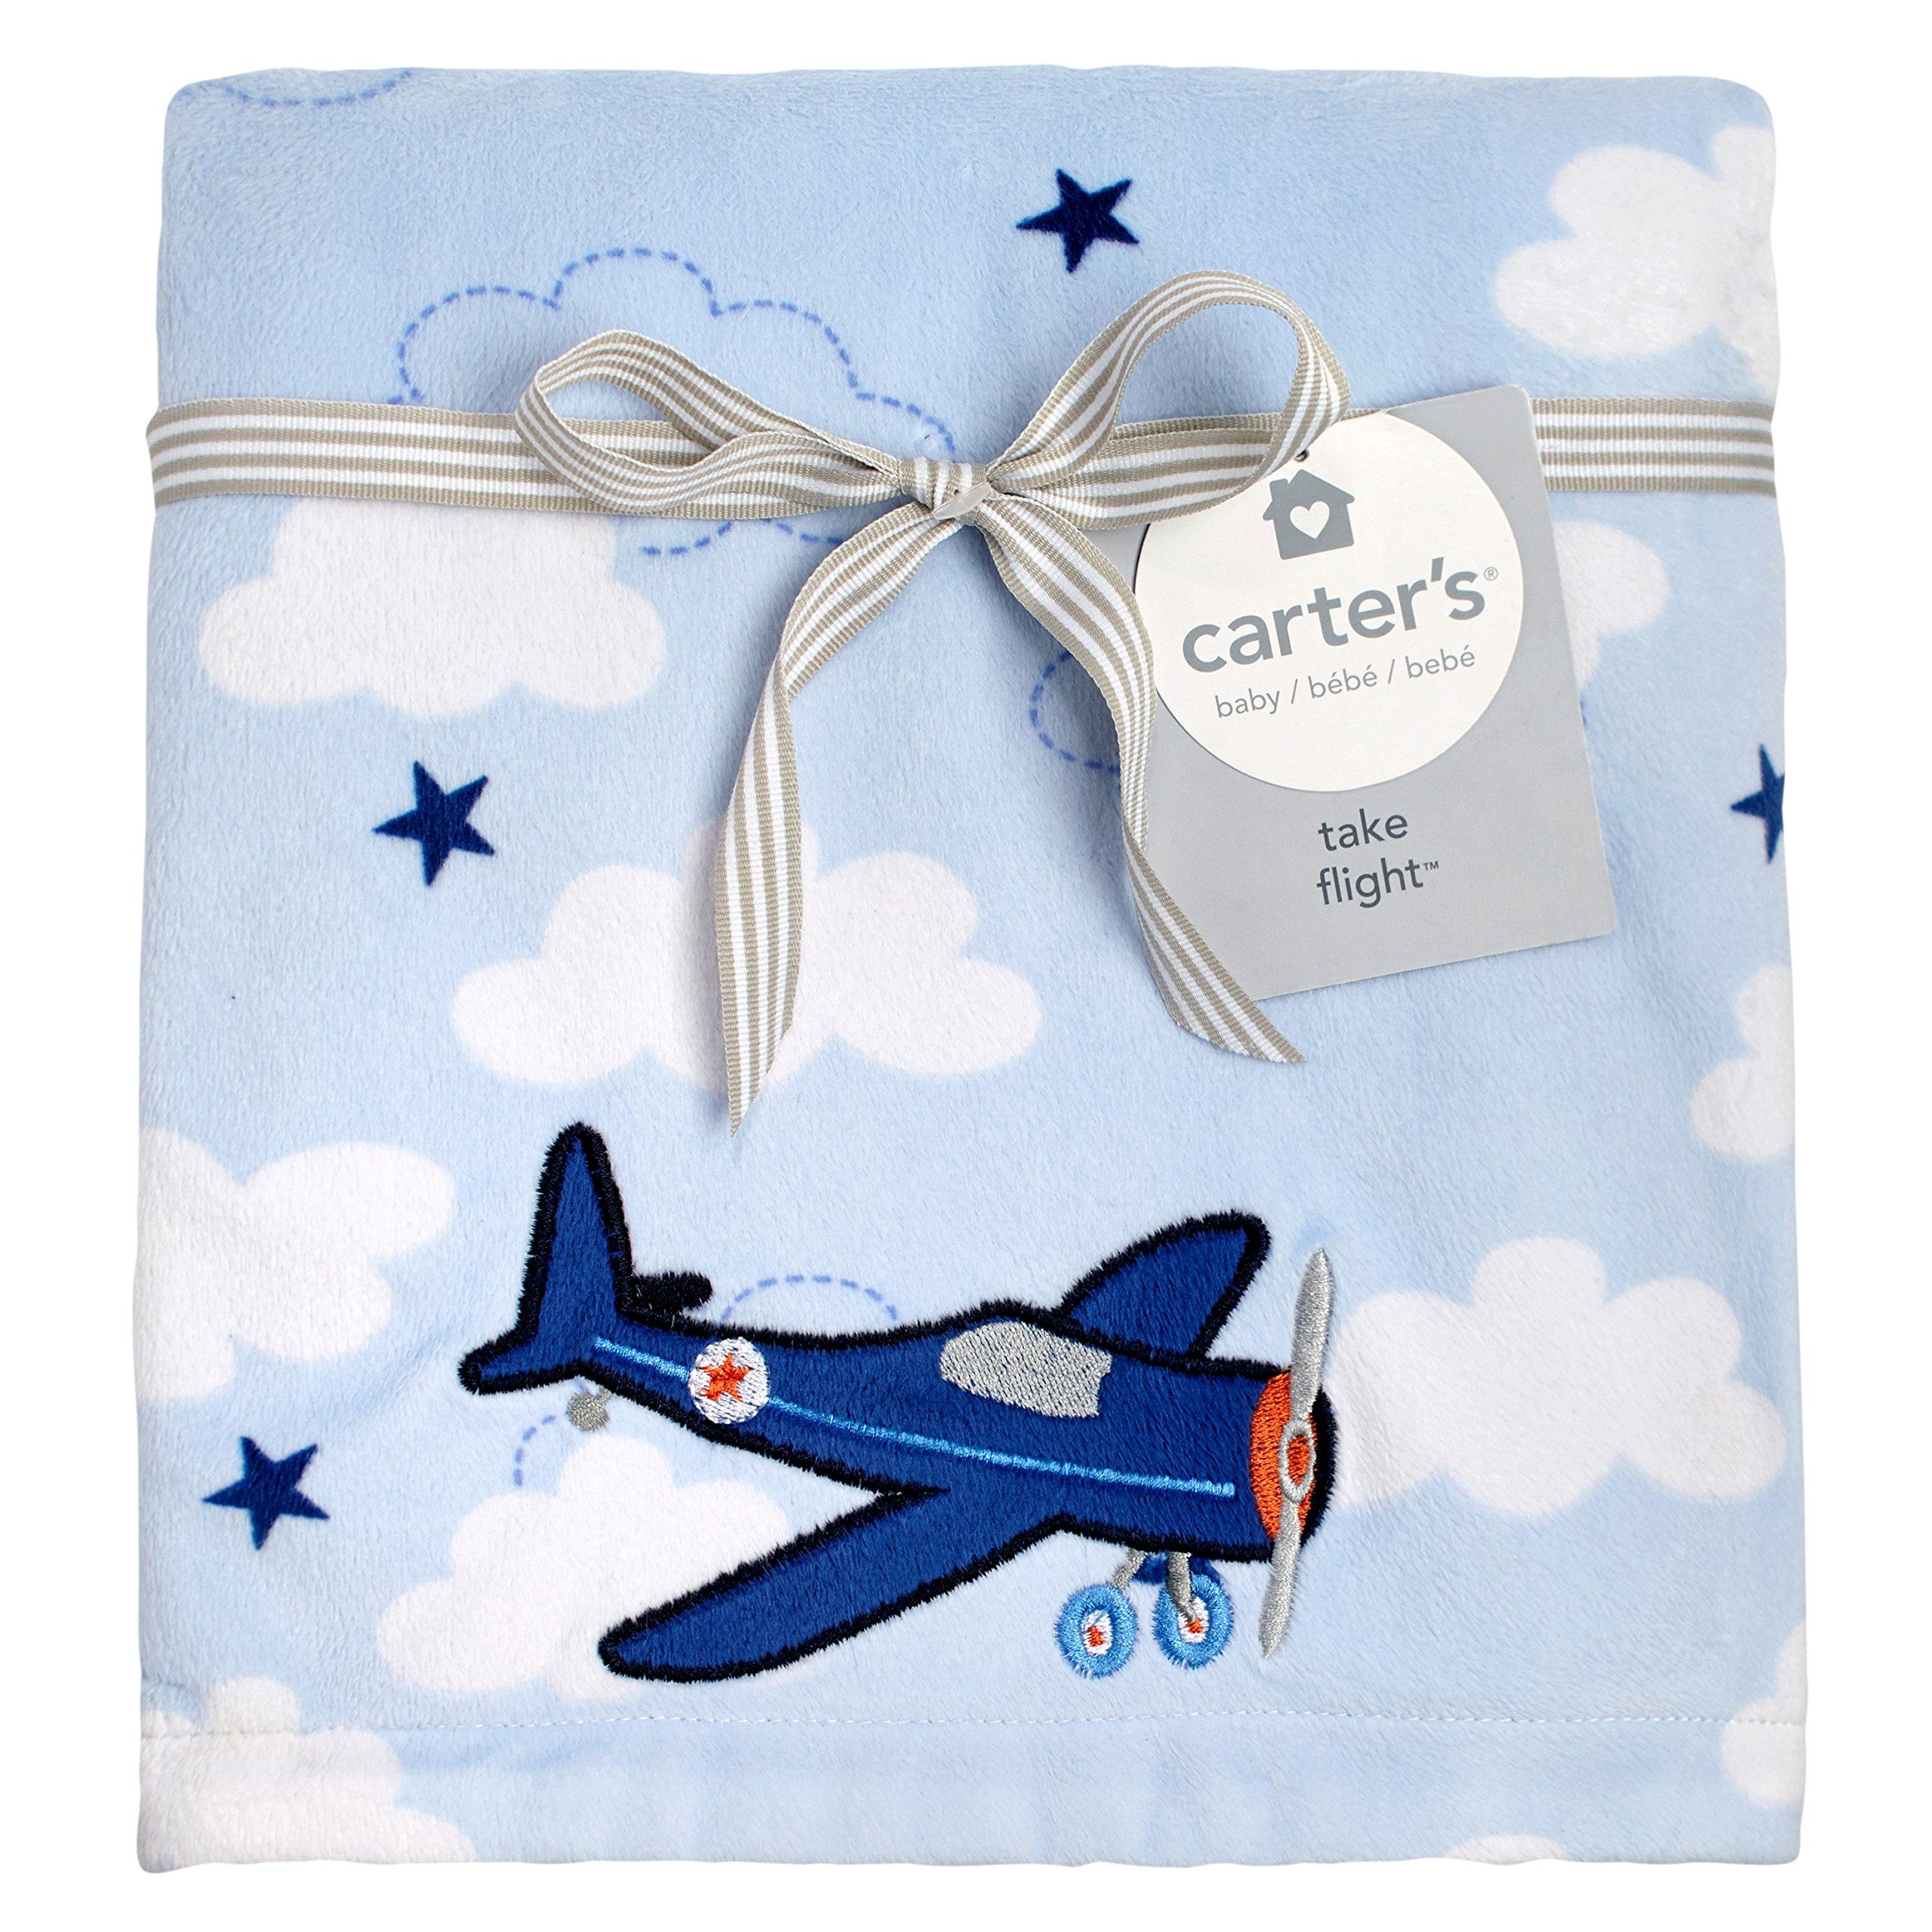 10bdec21c Details about Carter's Take Flight Airplane/Cloud Super Soft Appliqued Baby  Blanket, Blue,